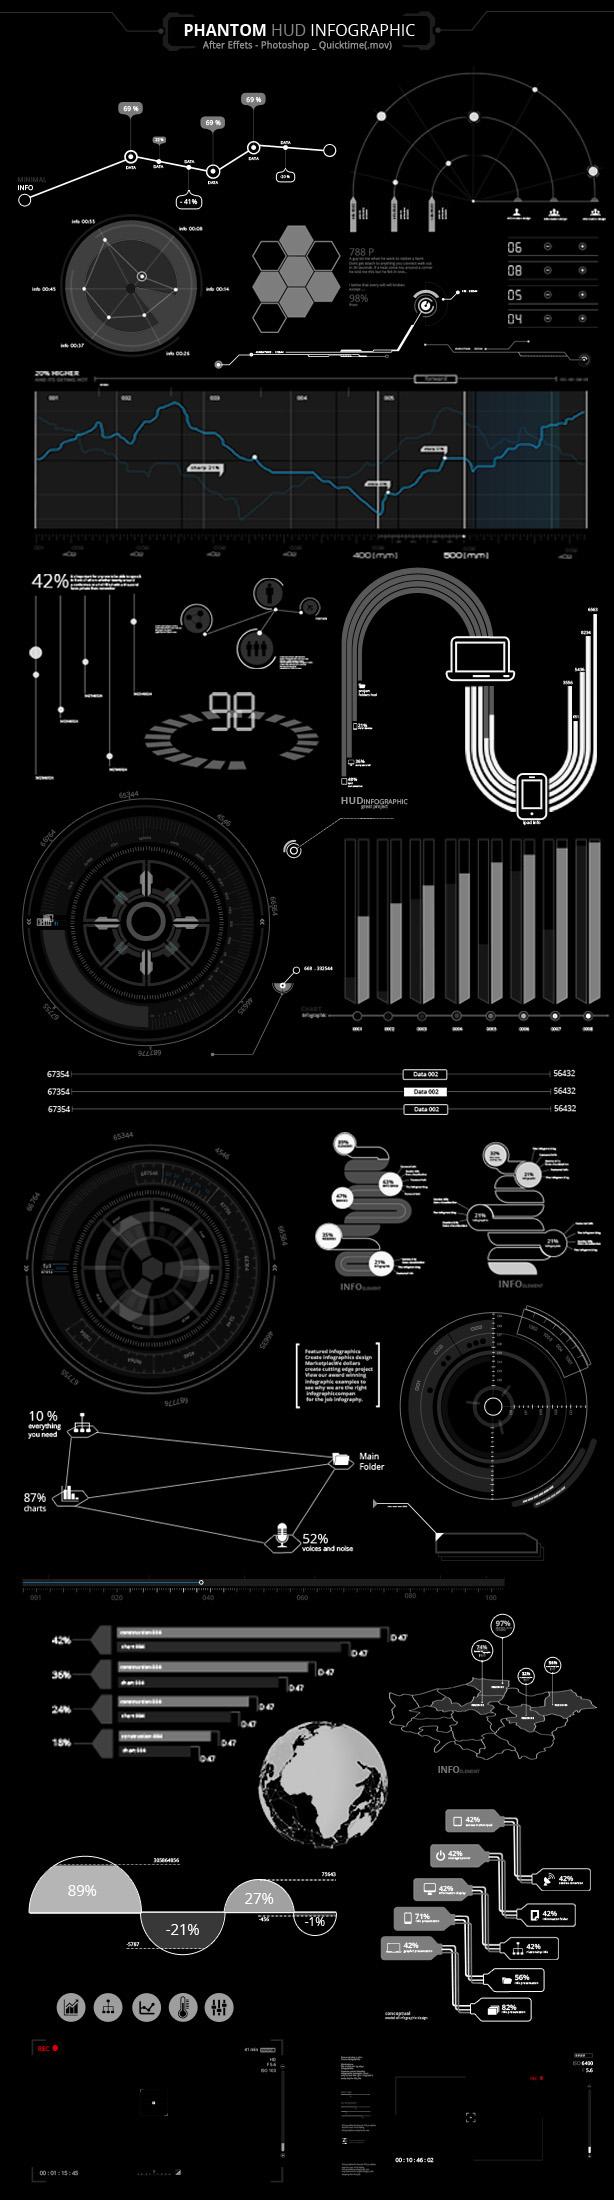 Phantom HUD Infographic - 8